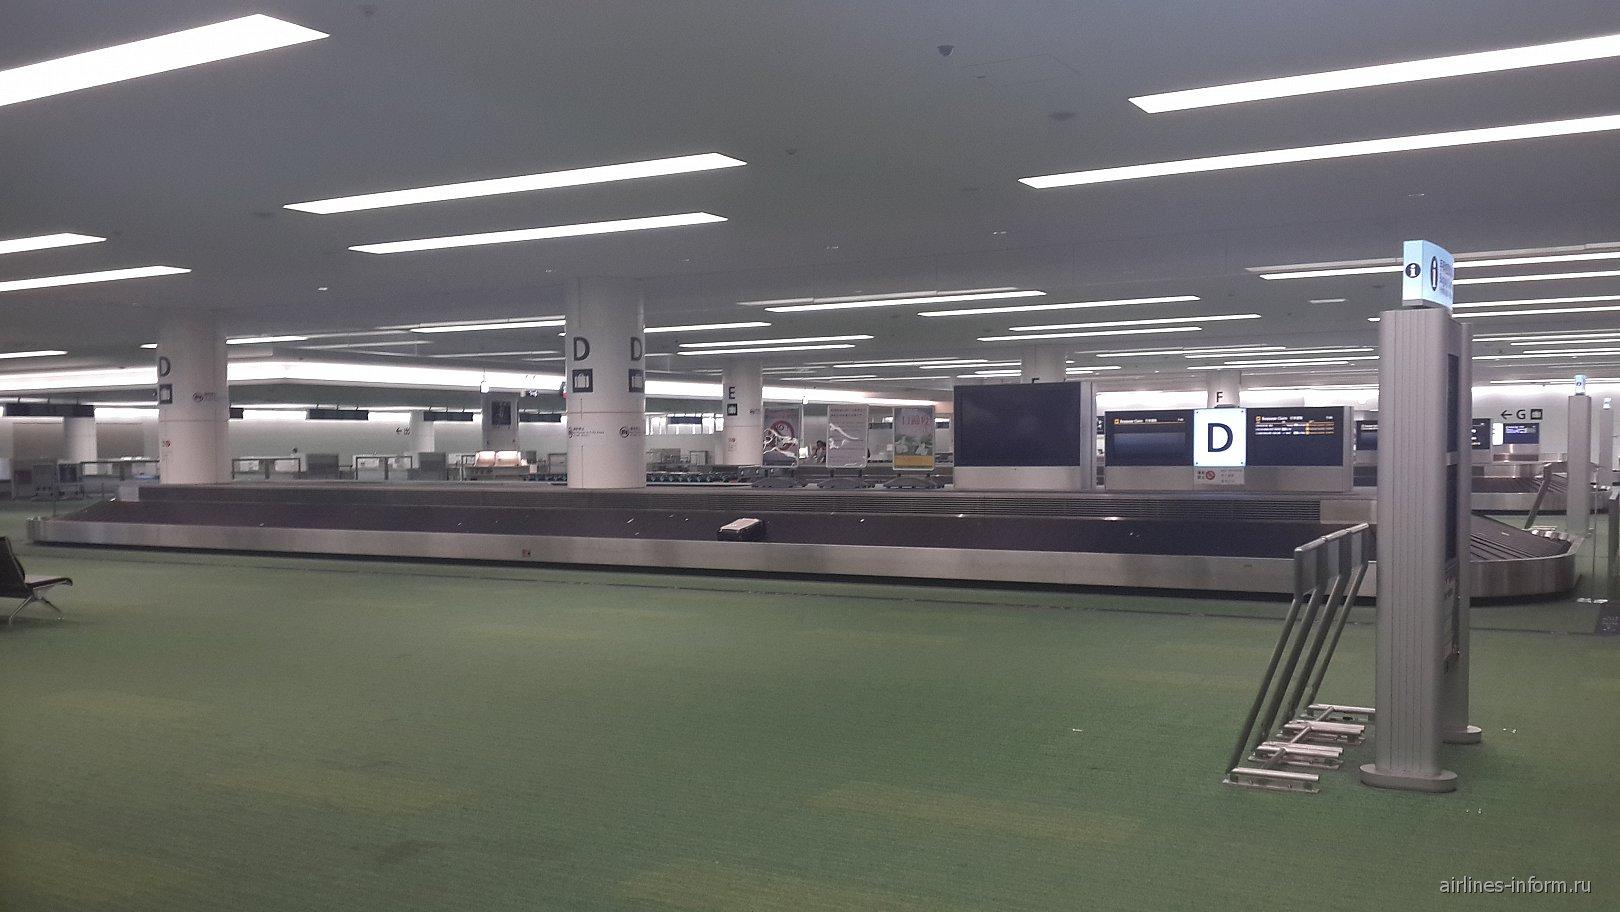 Зона выдачи багажа в аэропорту Токио Ханеда